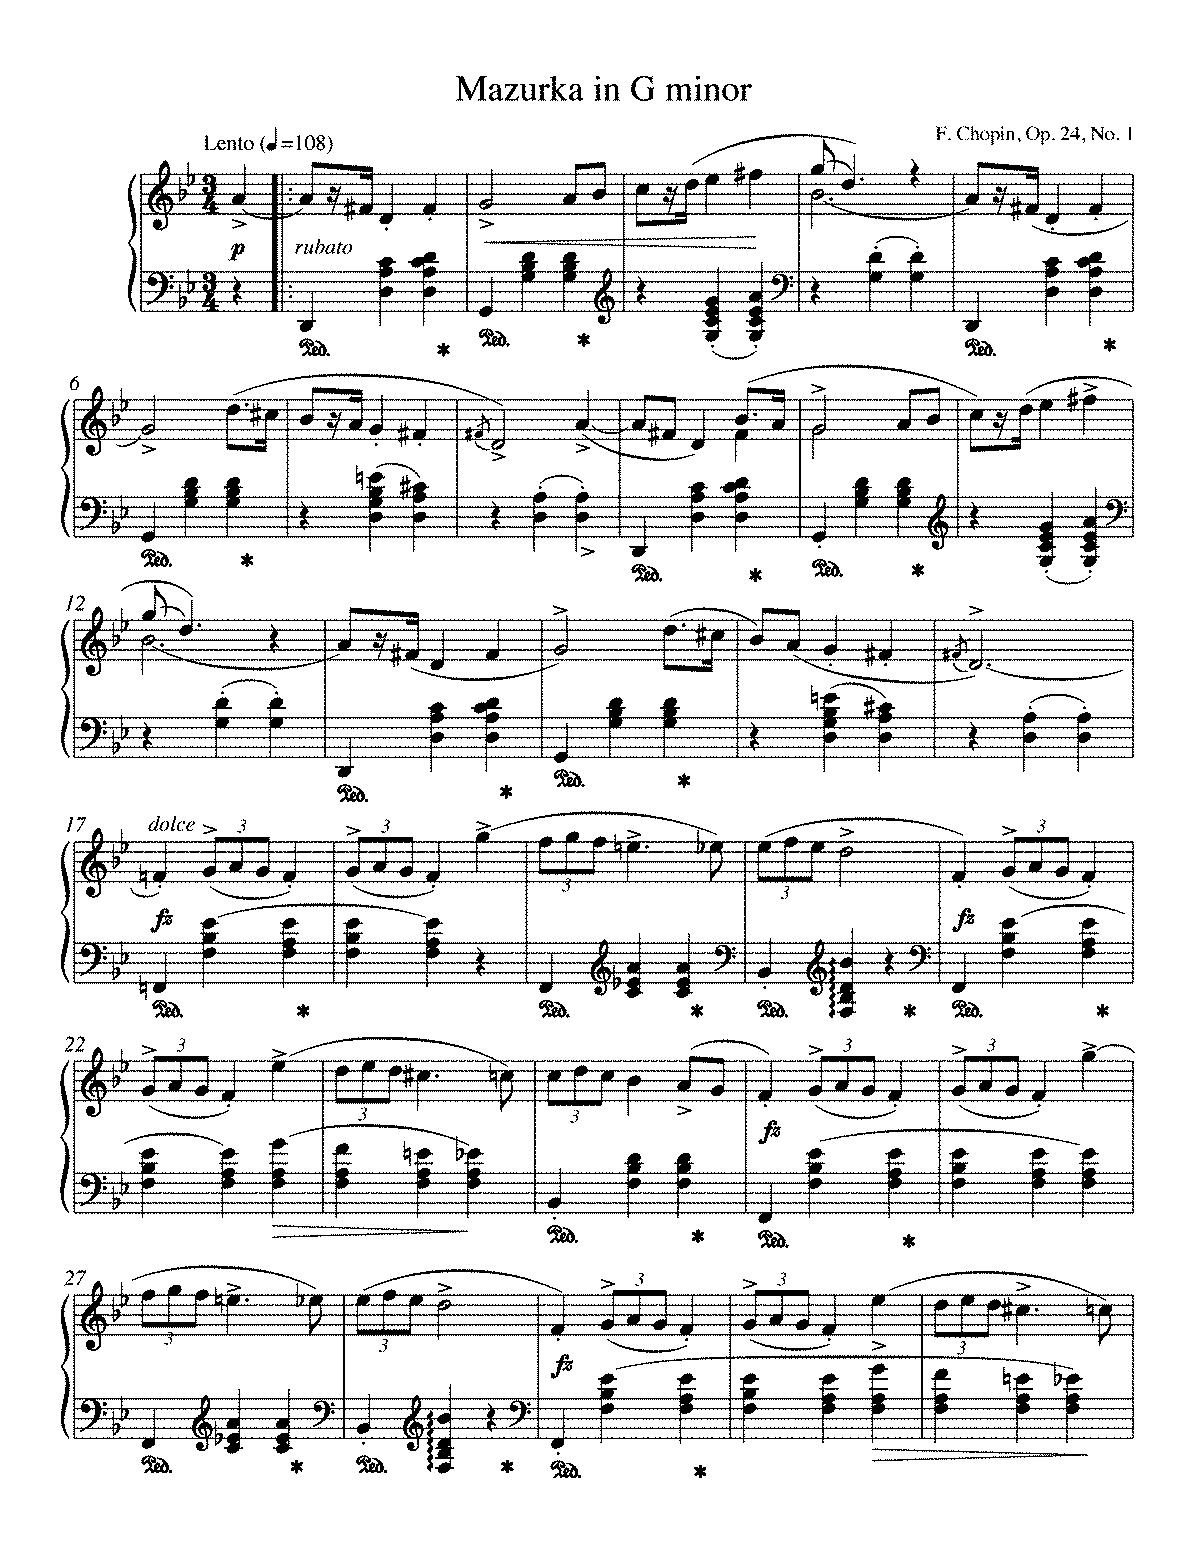 etude in c minor op.10 no.12 sheet music pdf